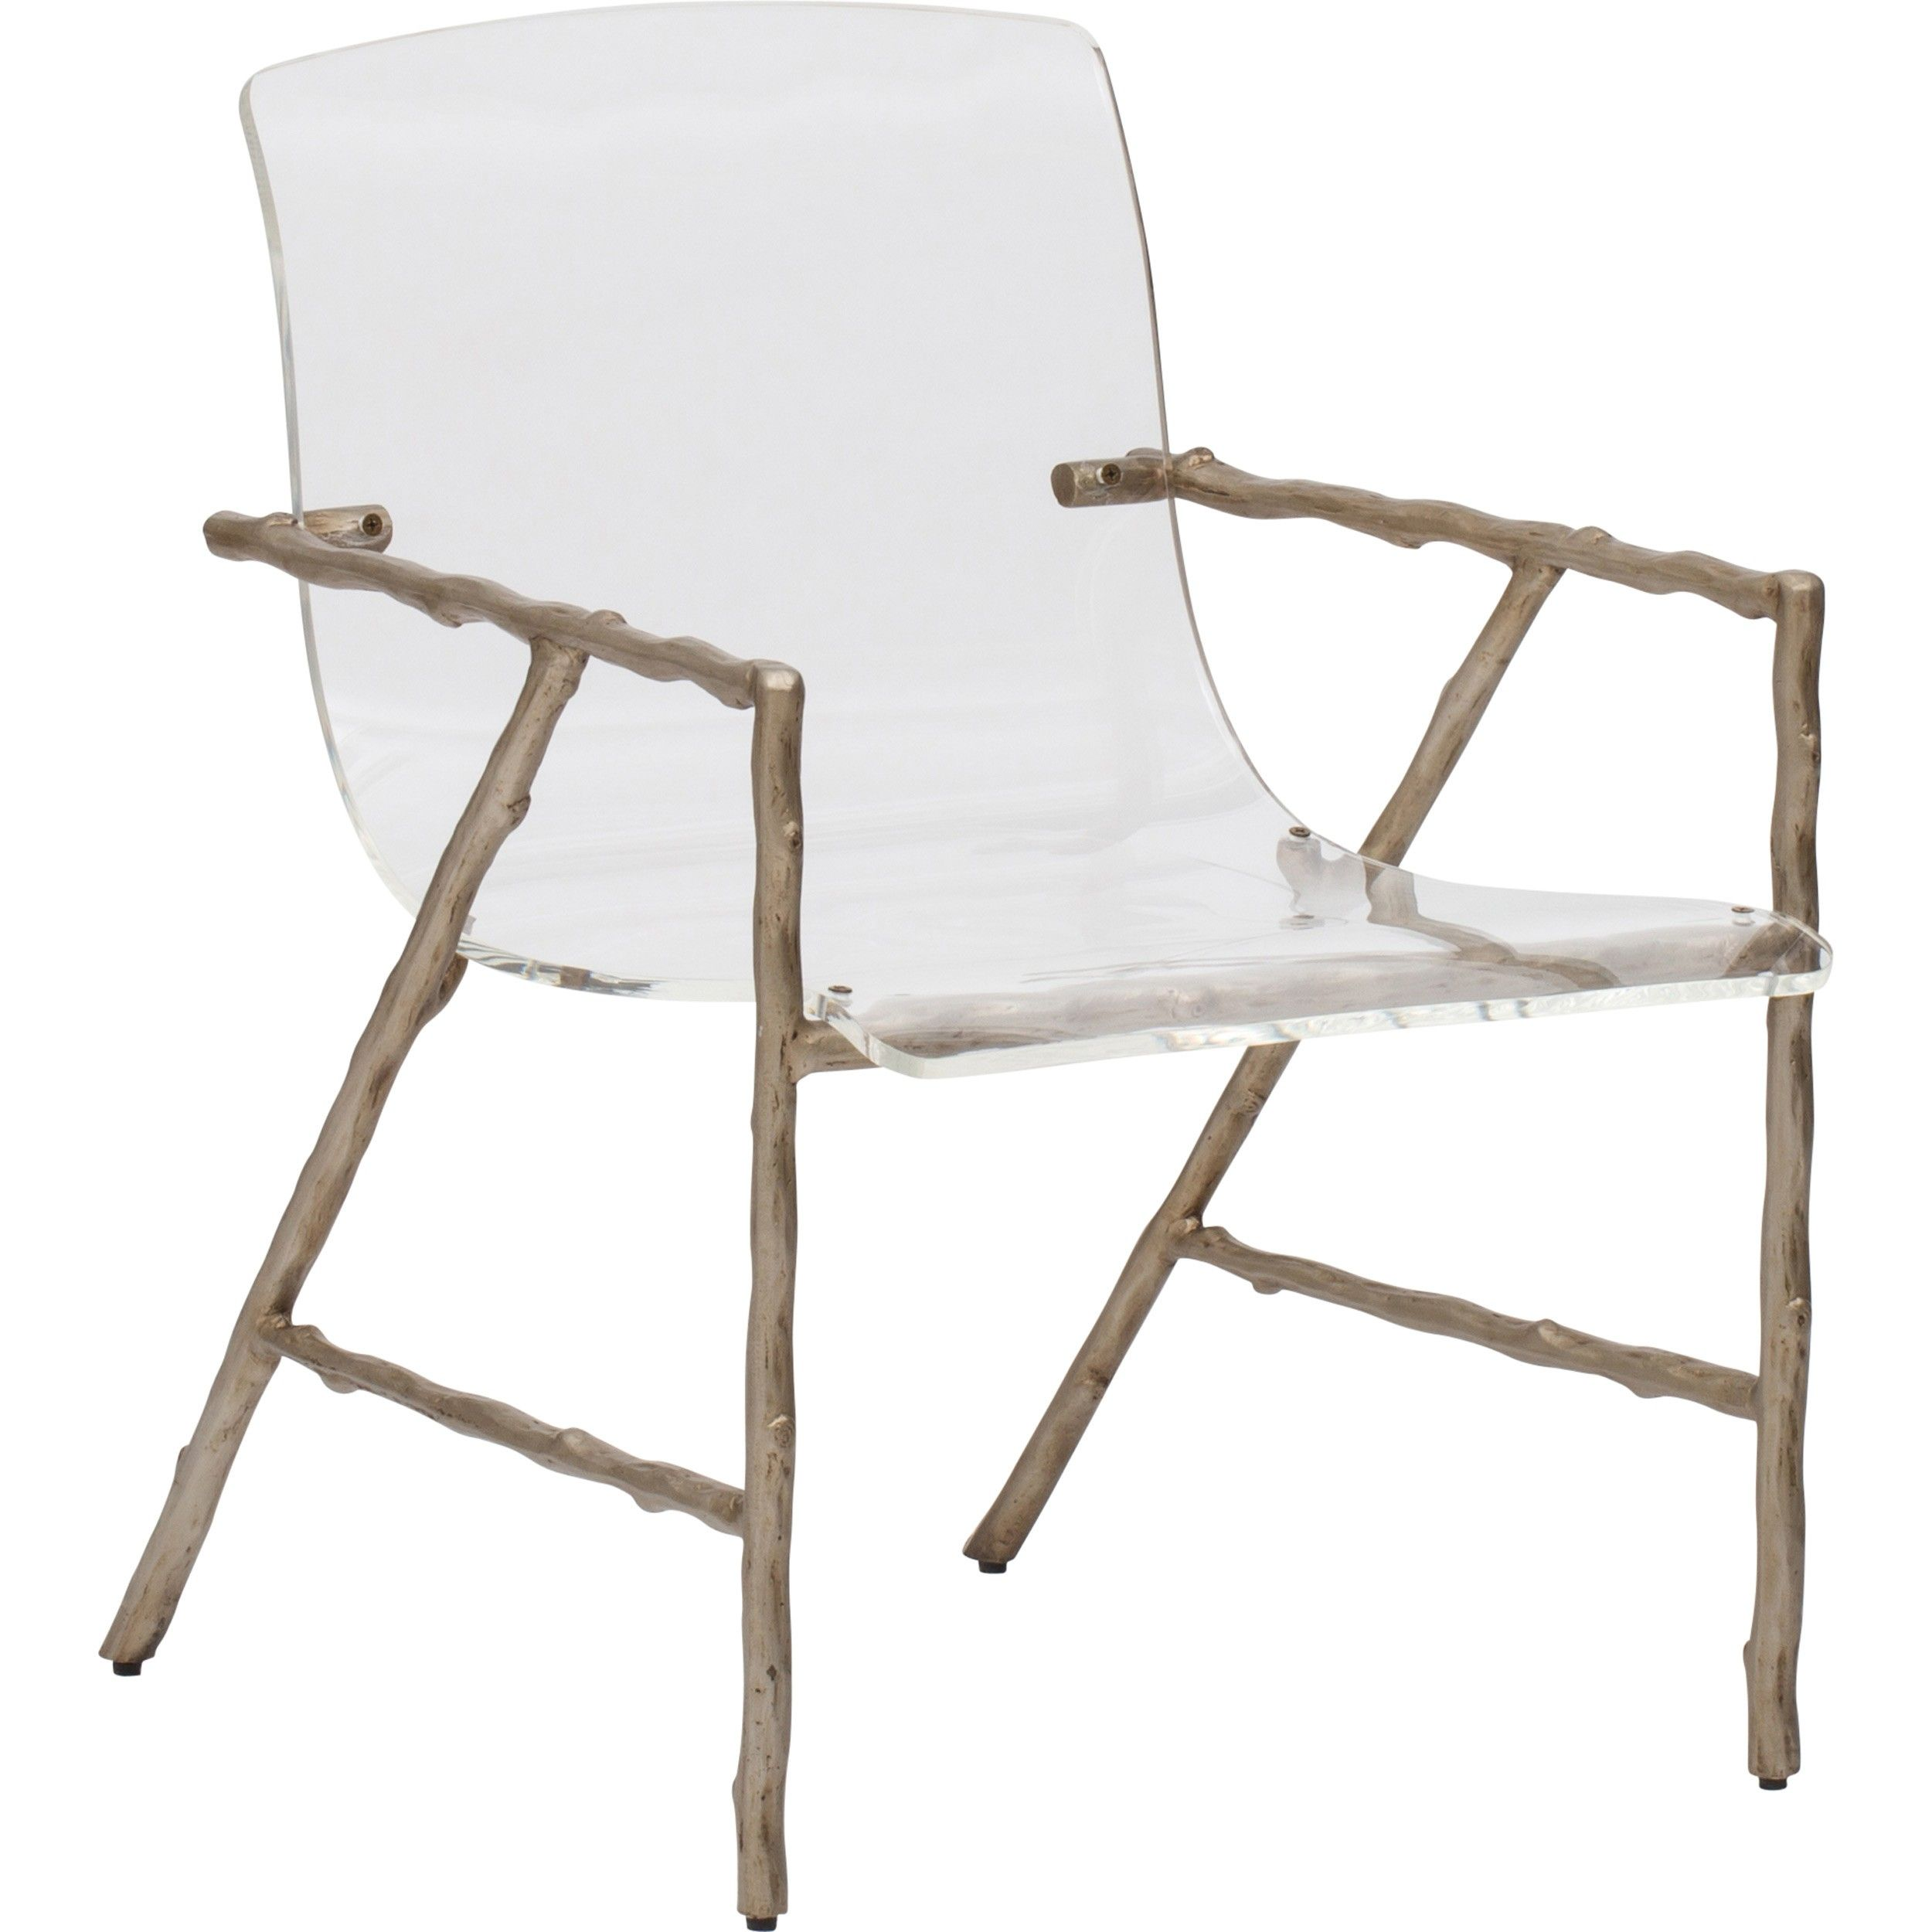 Dillard Acrylic Chair, Faux Bois Luxe